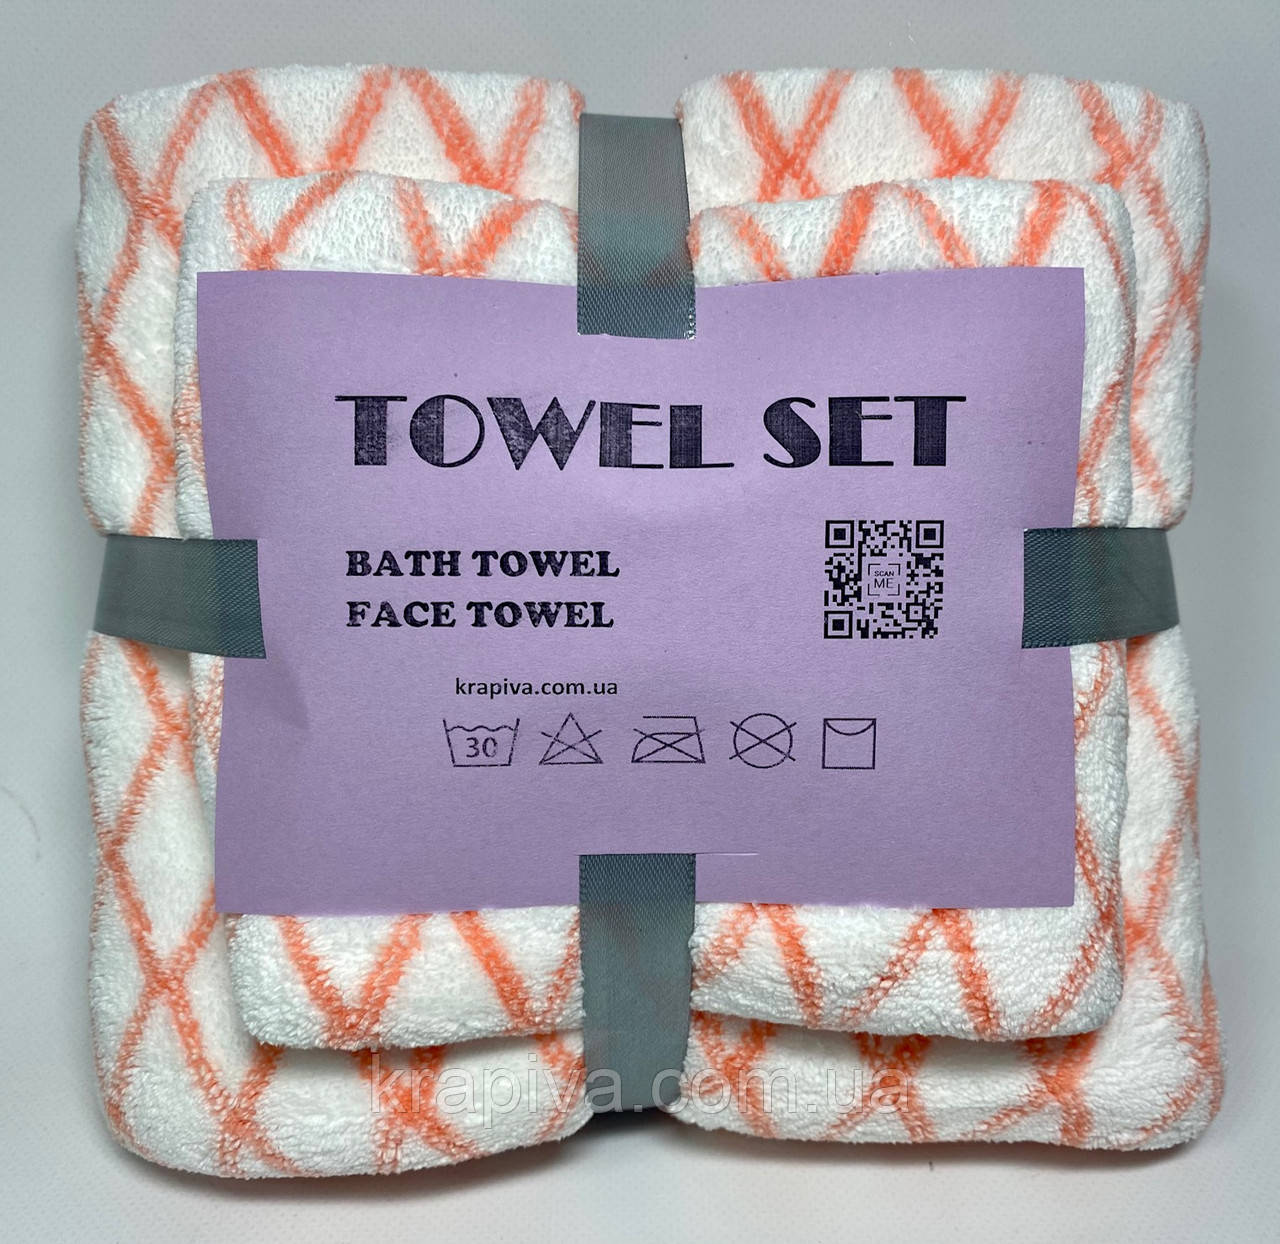 Полотенце набор комплект Премиум (140*70, 75*35) баня сауна, рушник комплект для сауни, бані, дому